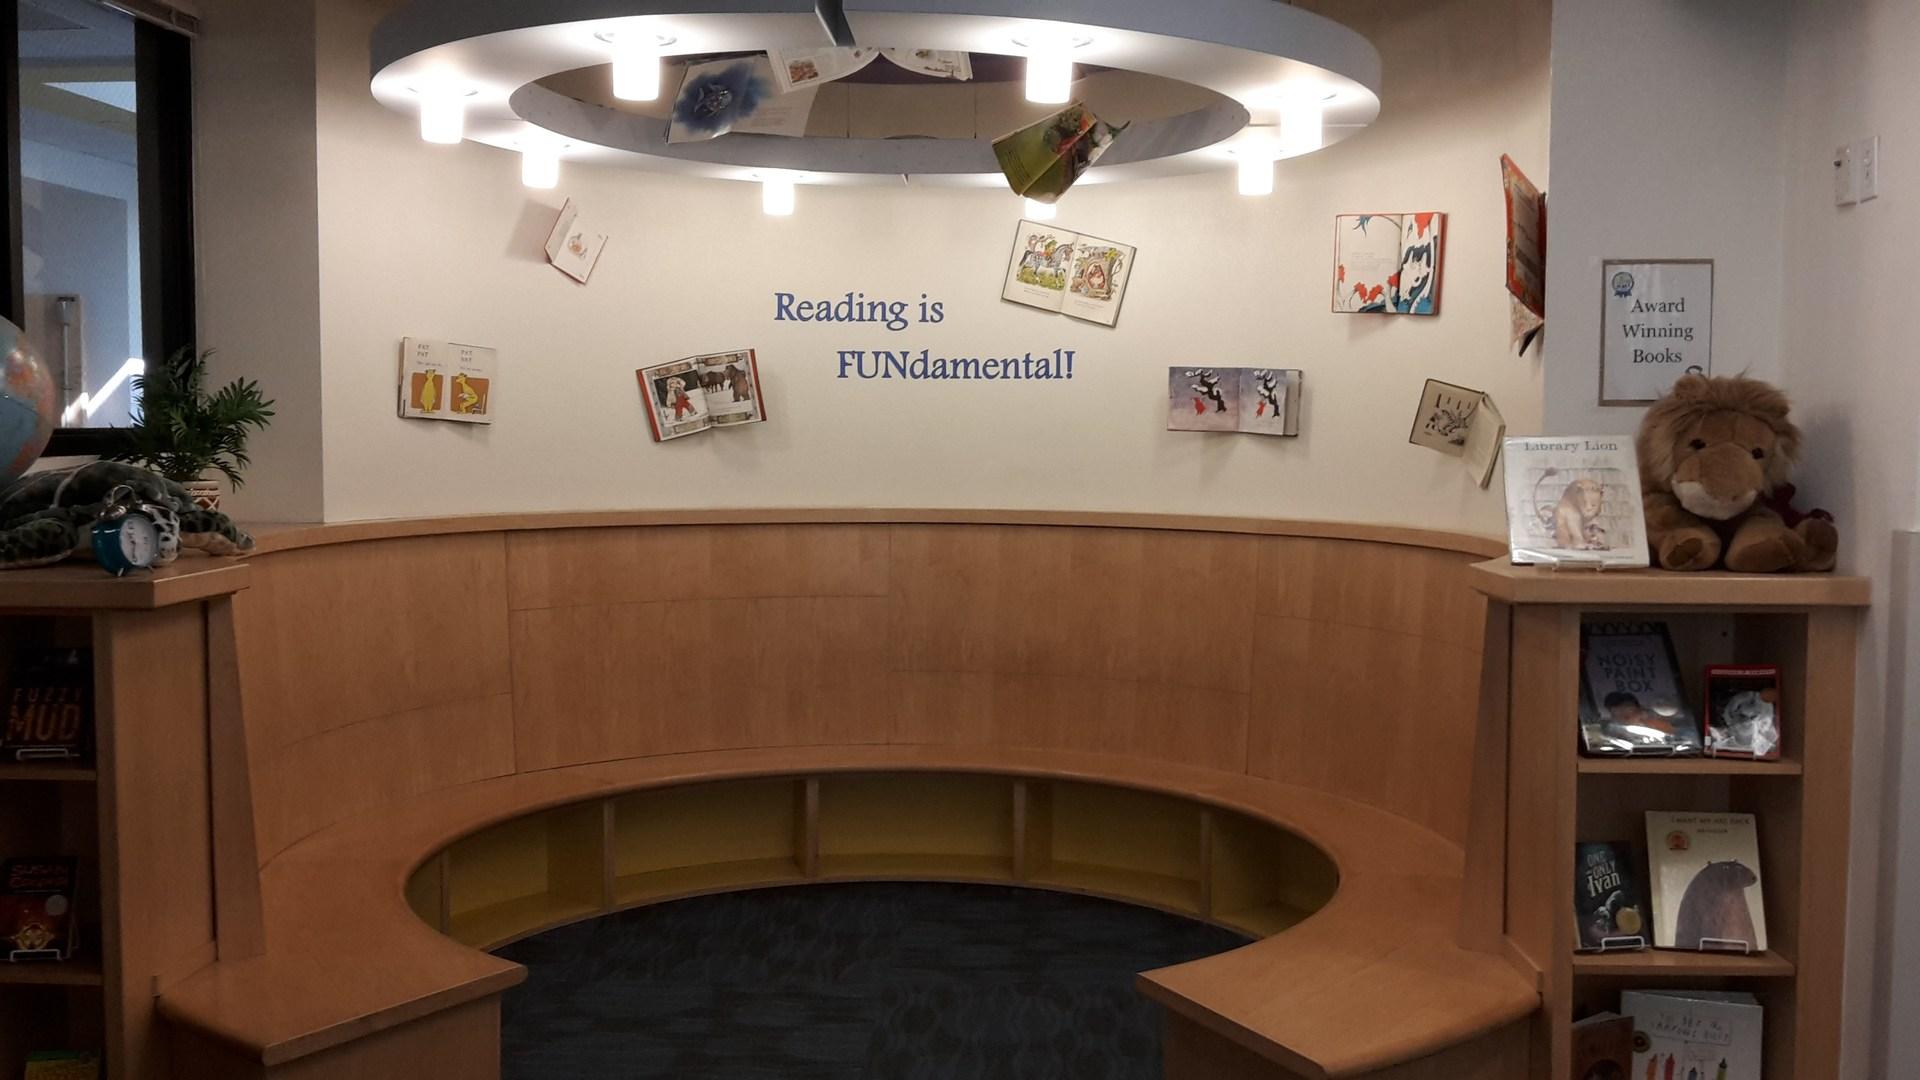 Park media center.